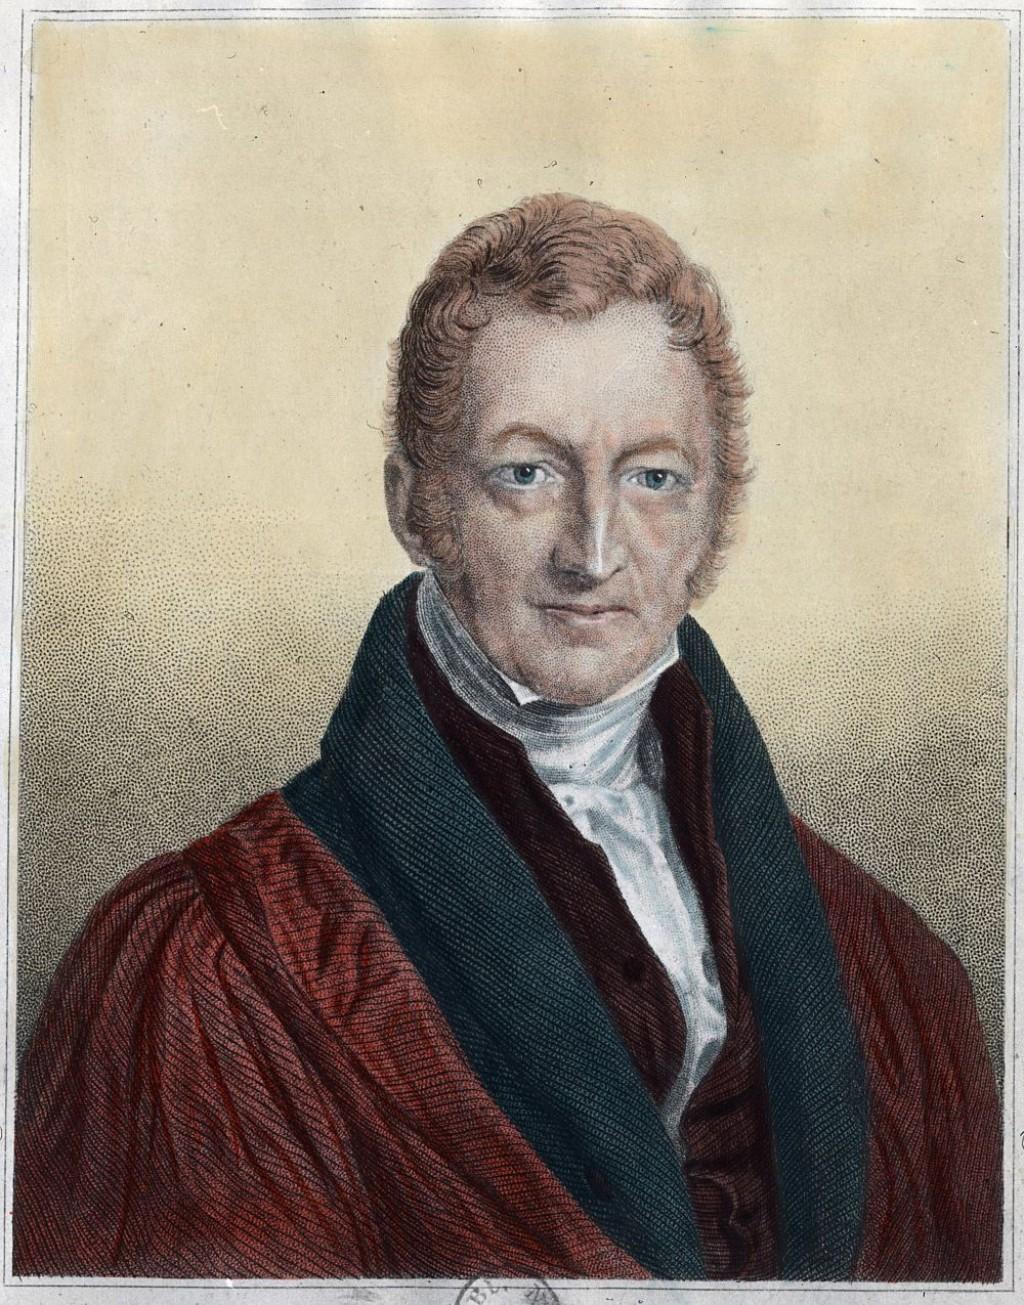 023 Thomas Malthus Essay On The Principle Of Population Example W1000 1798 1 Principe Stupendous After Reading Malthus's Principles Darwin Got Idea That Ap Euro Large